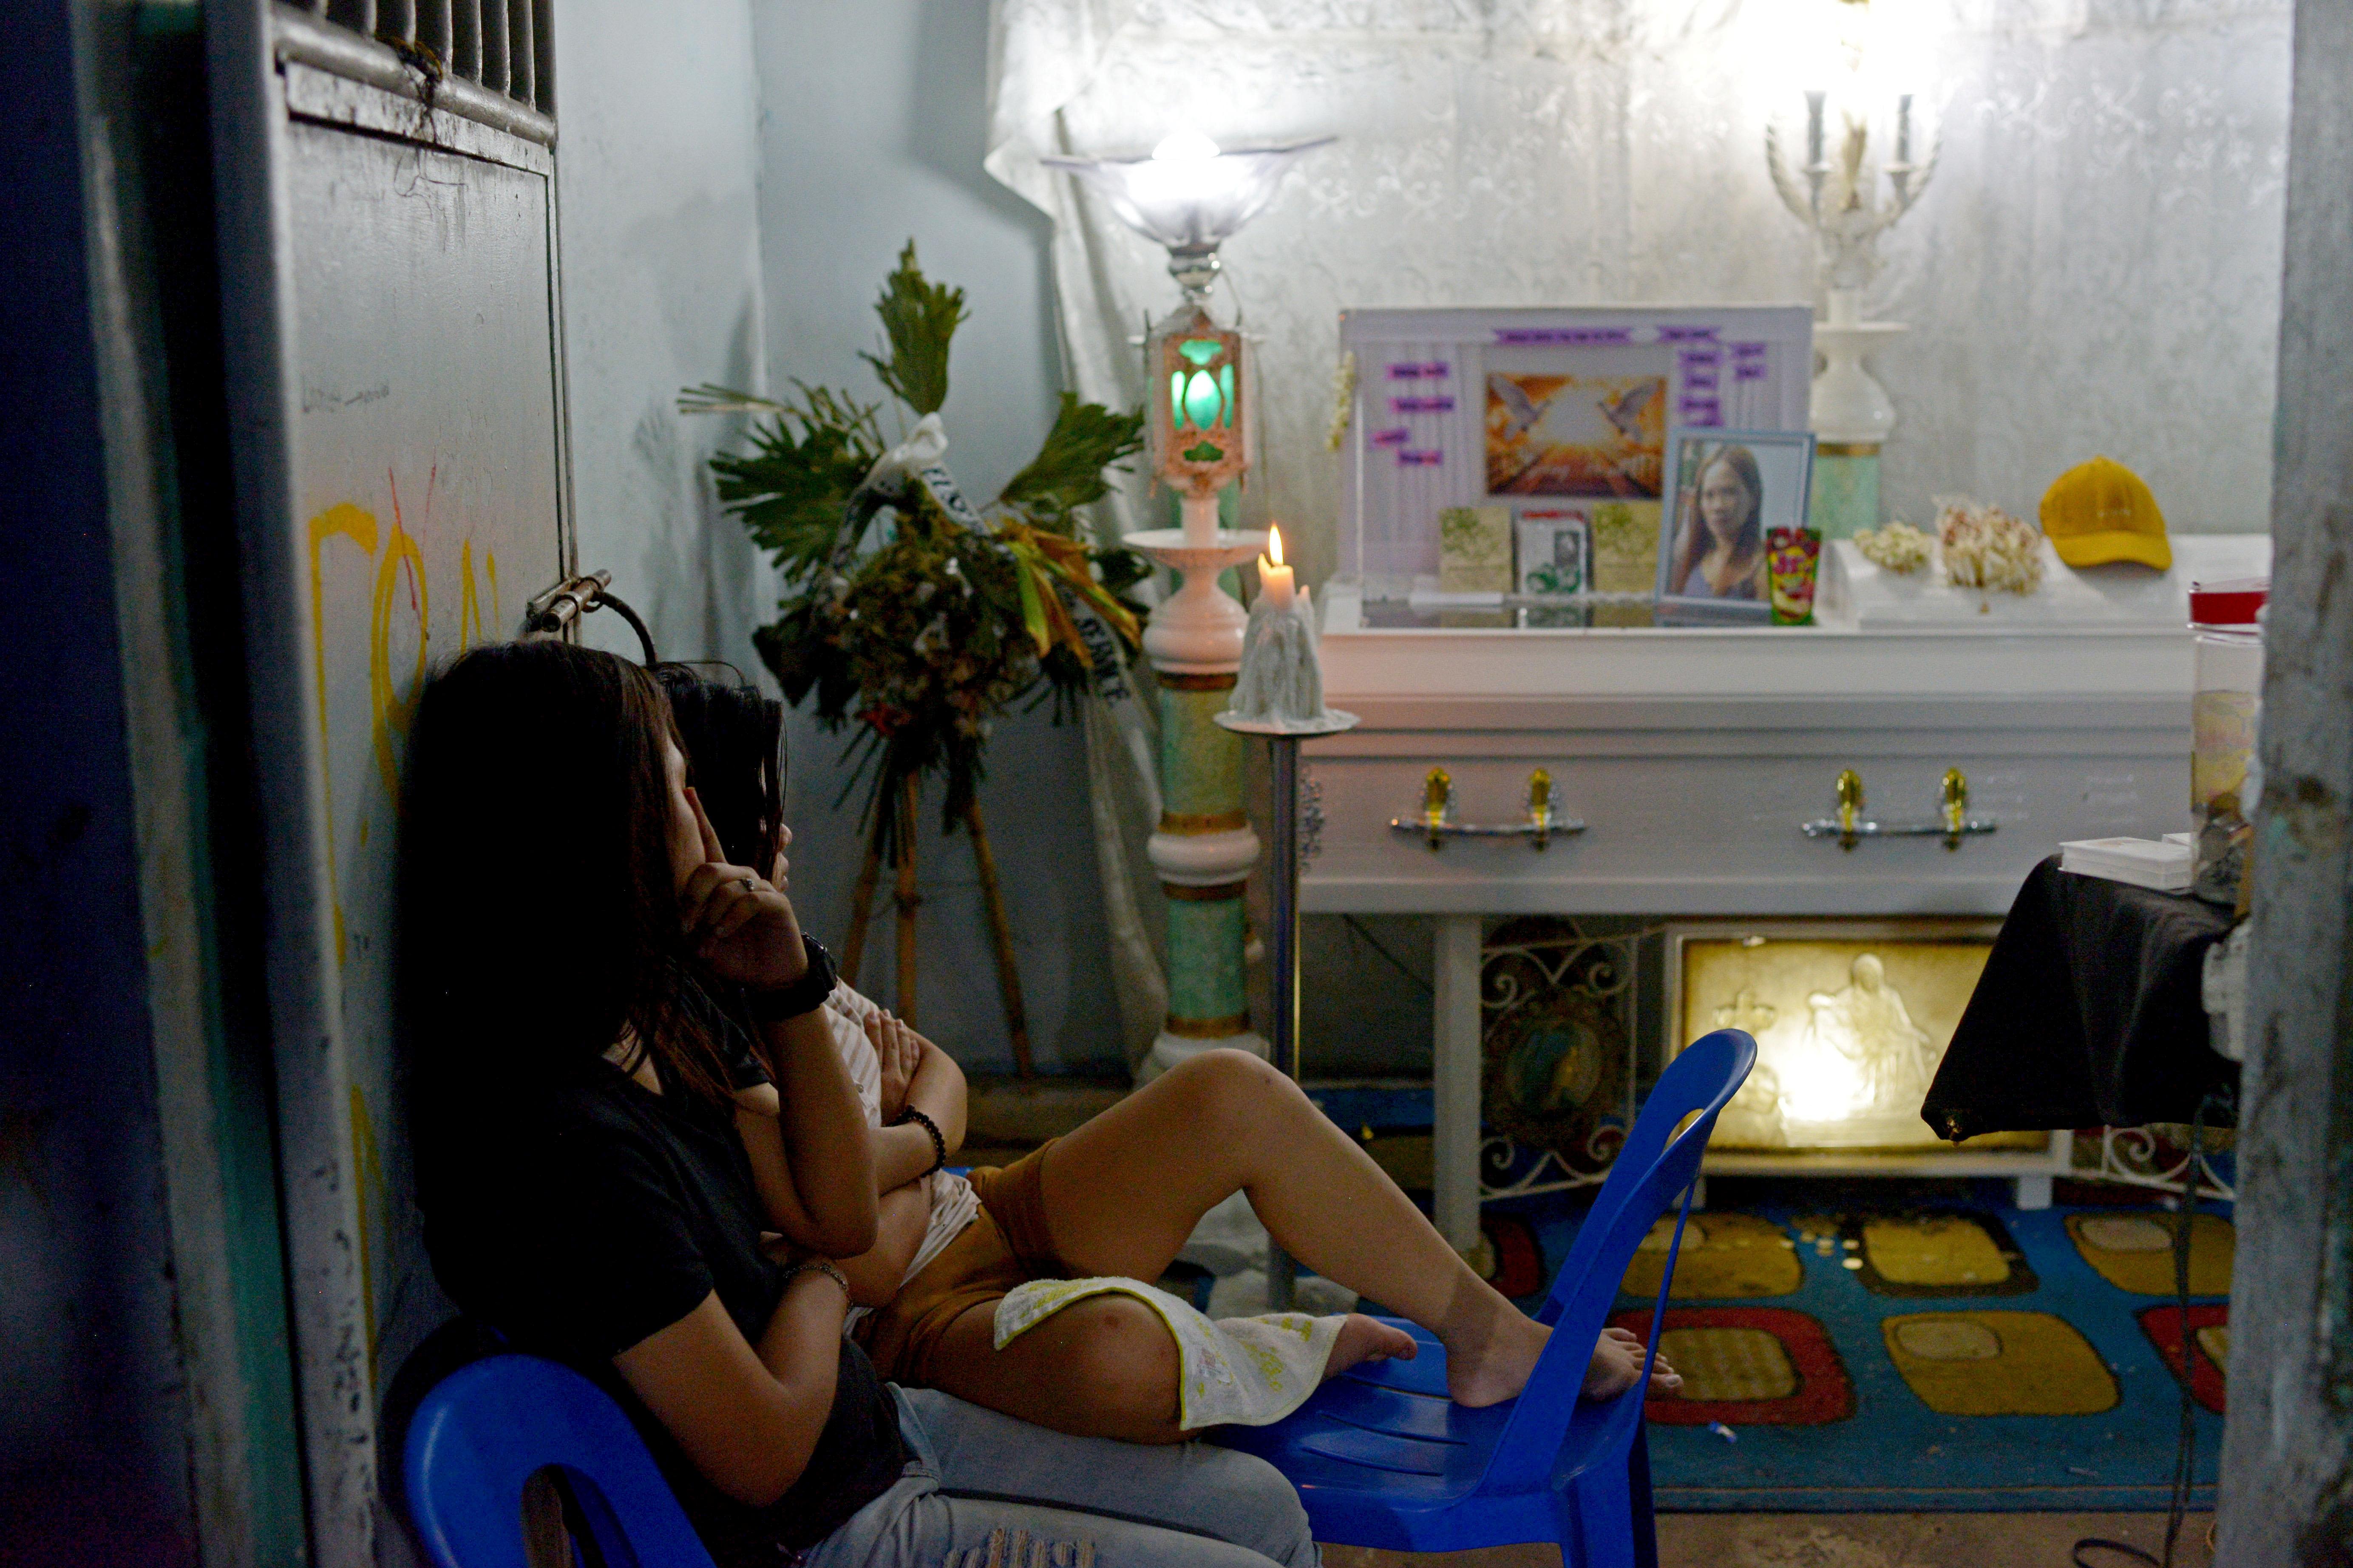 Philippine drug war critics hope U.N. probe can dent Duterte's deadly campaign